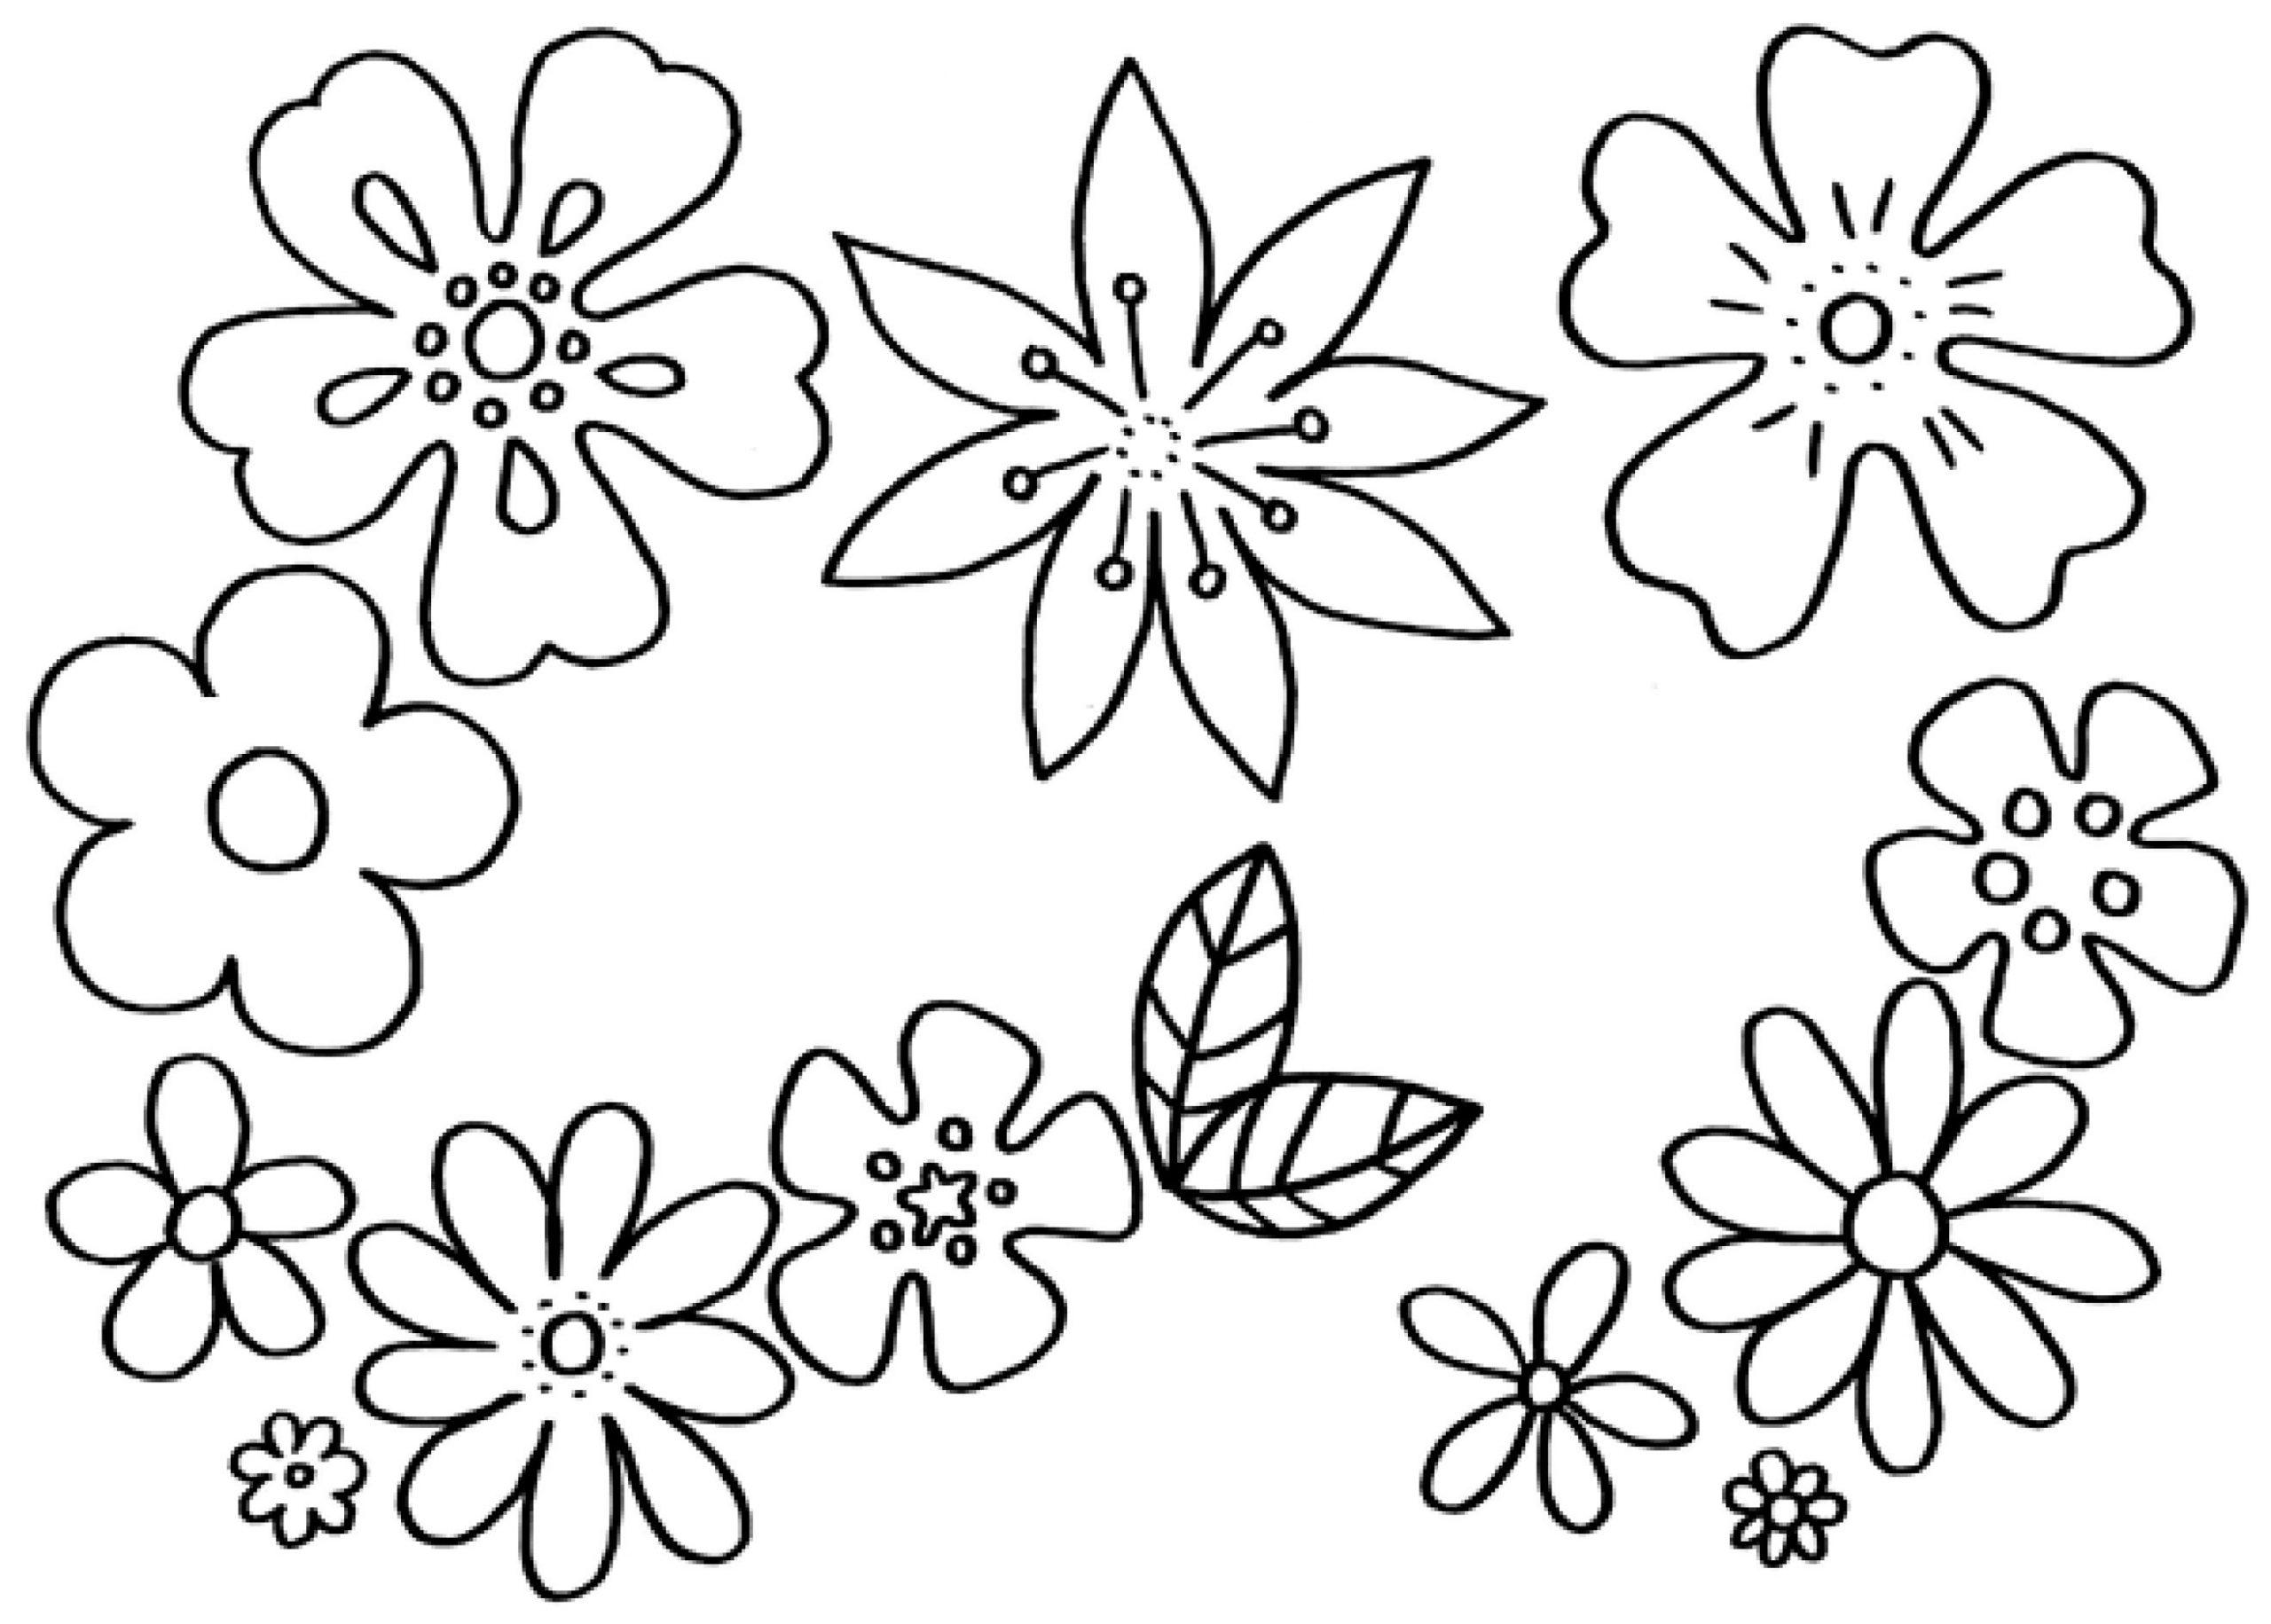 Malvorlagen Blumen - Kostenlose Ausmalbilder | Mytoys Blog über Ausmalbilder Frühlingsblumen